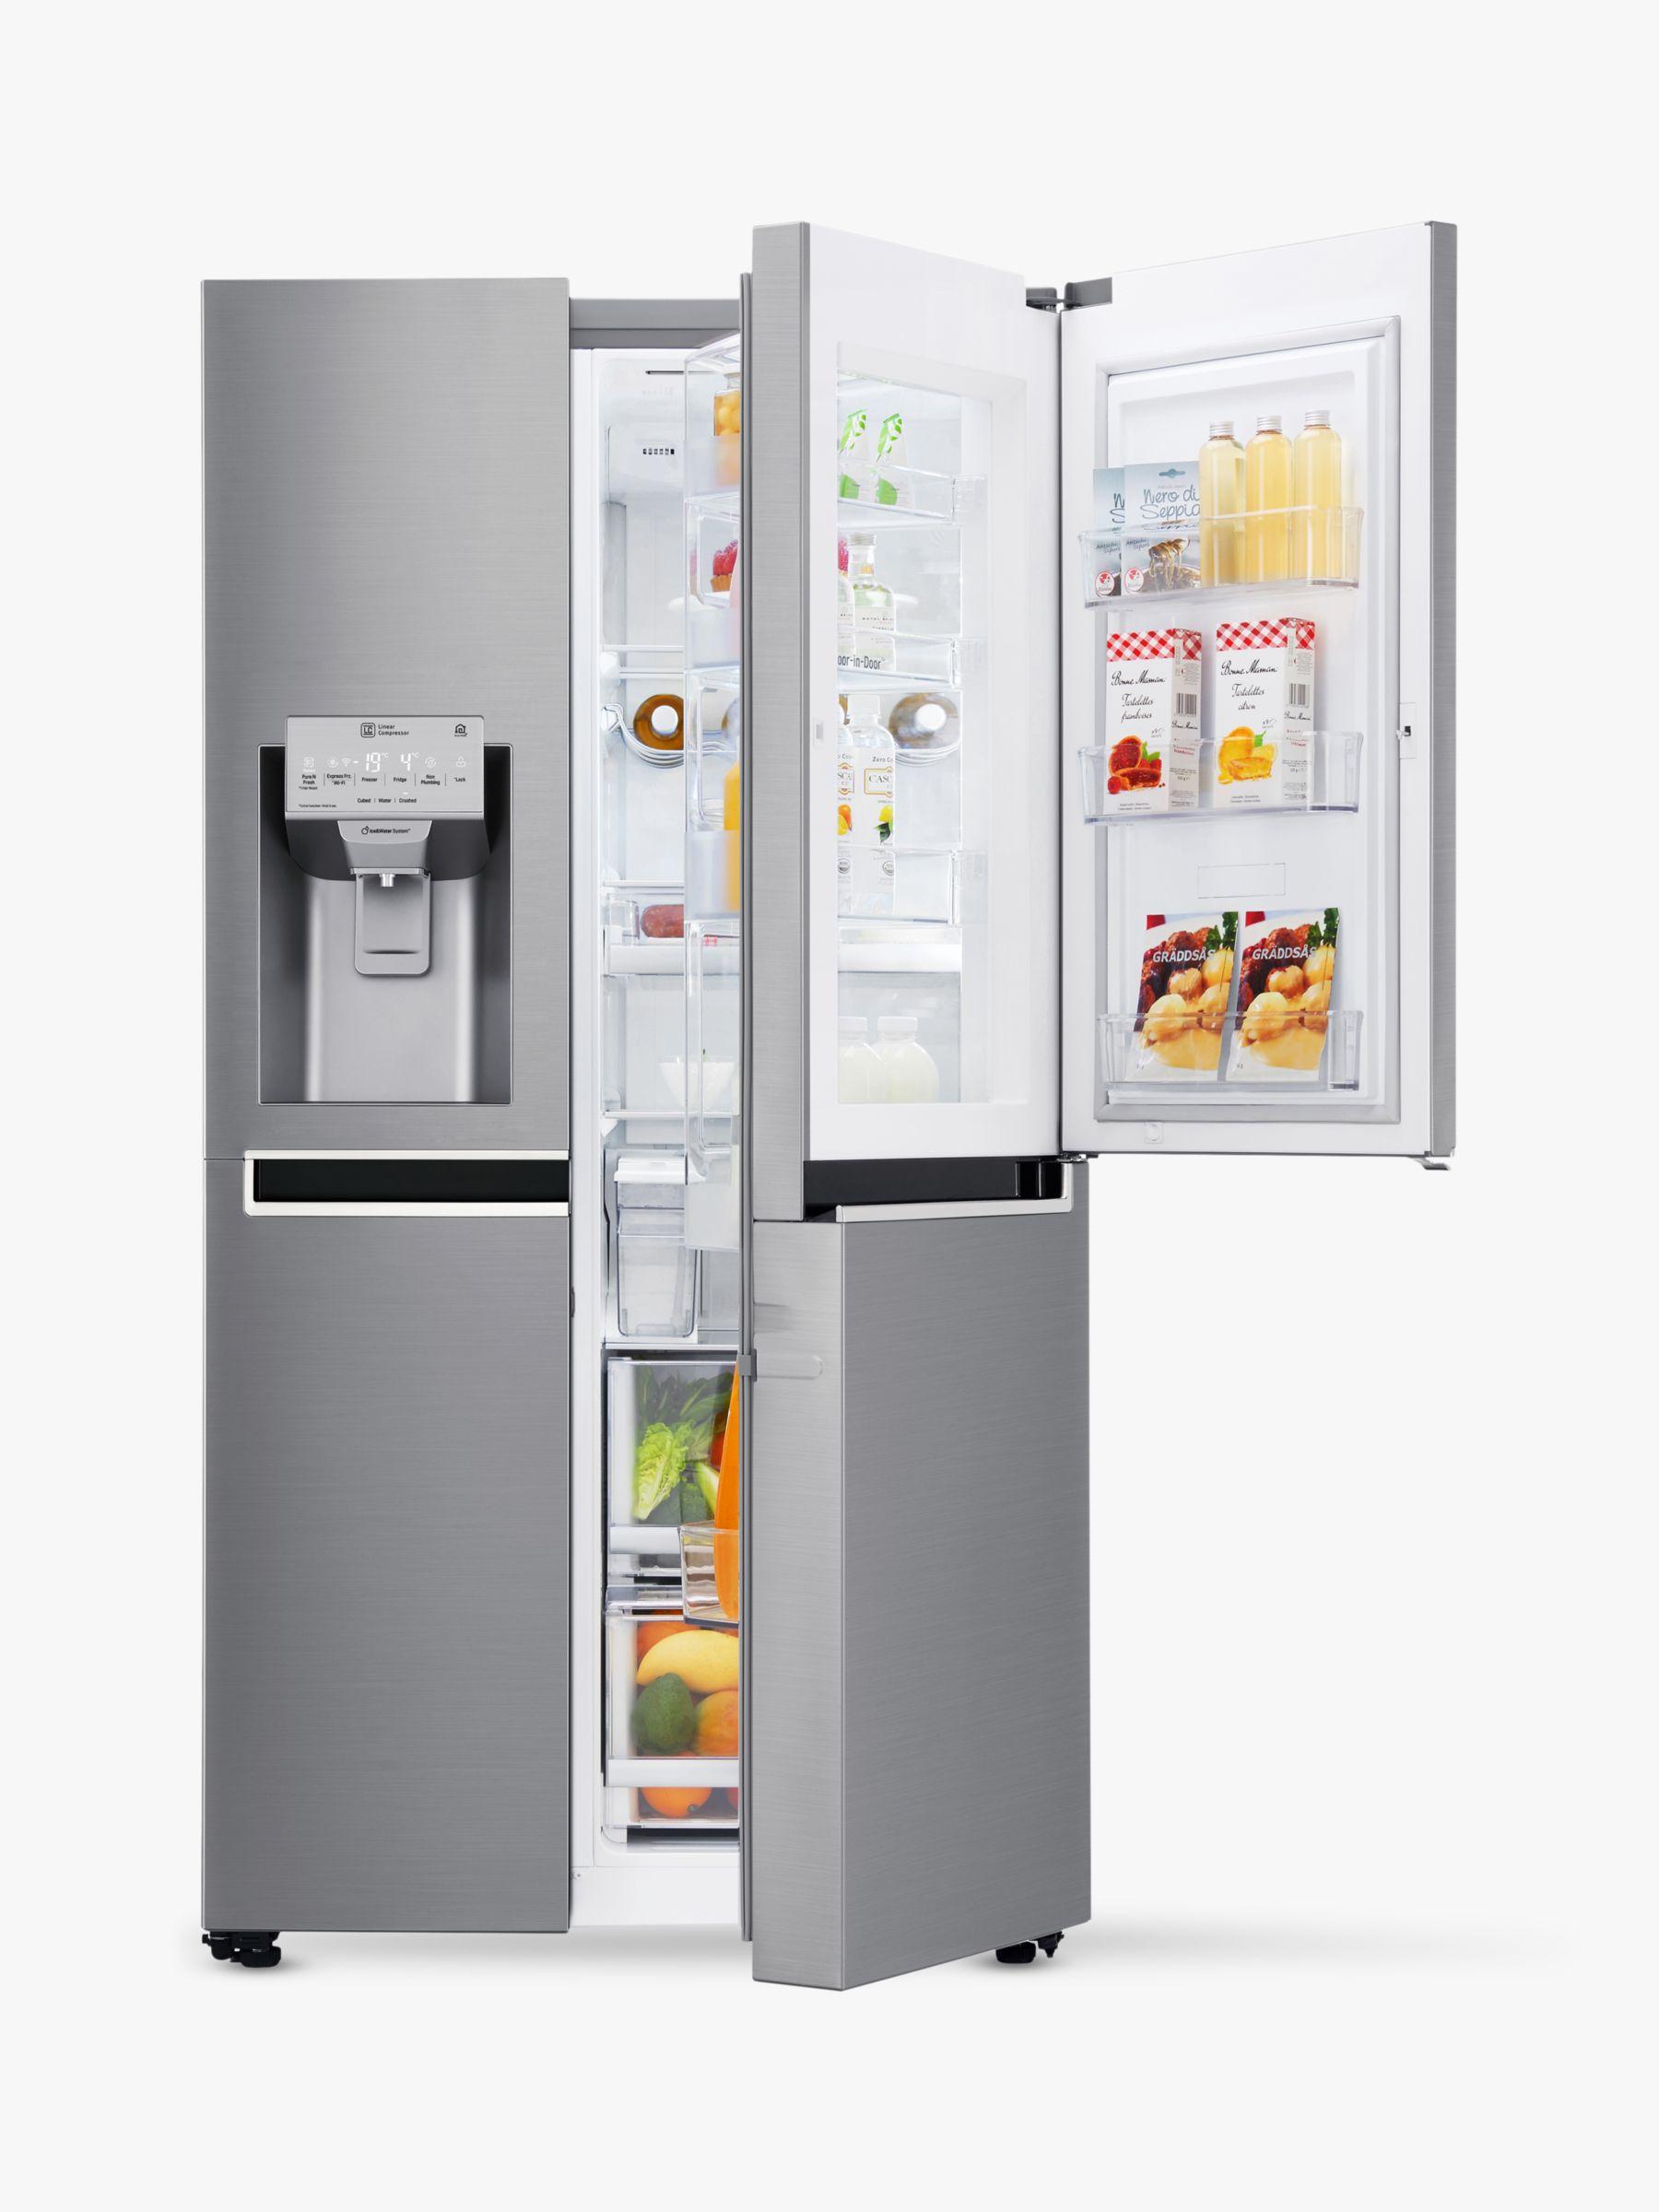 LG LG GSJ961PZVV Wi-Fi American Style Fridge Freezer, A+ Energy Rating, 91.2cm Wide, Shiny Steel